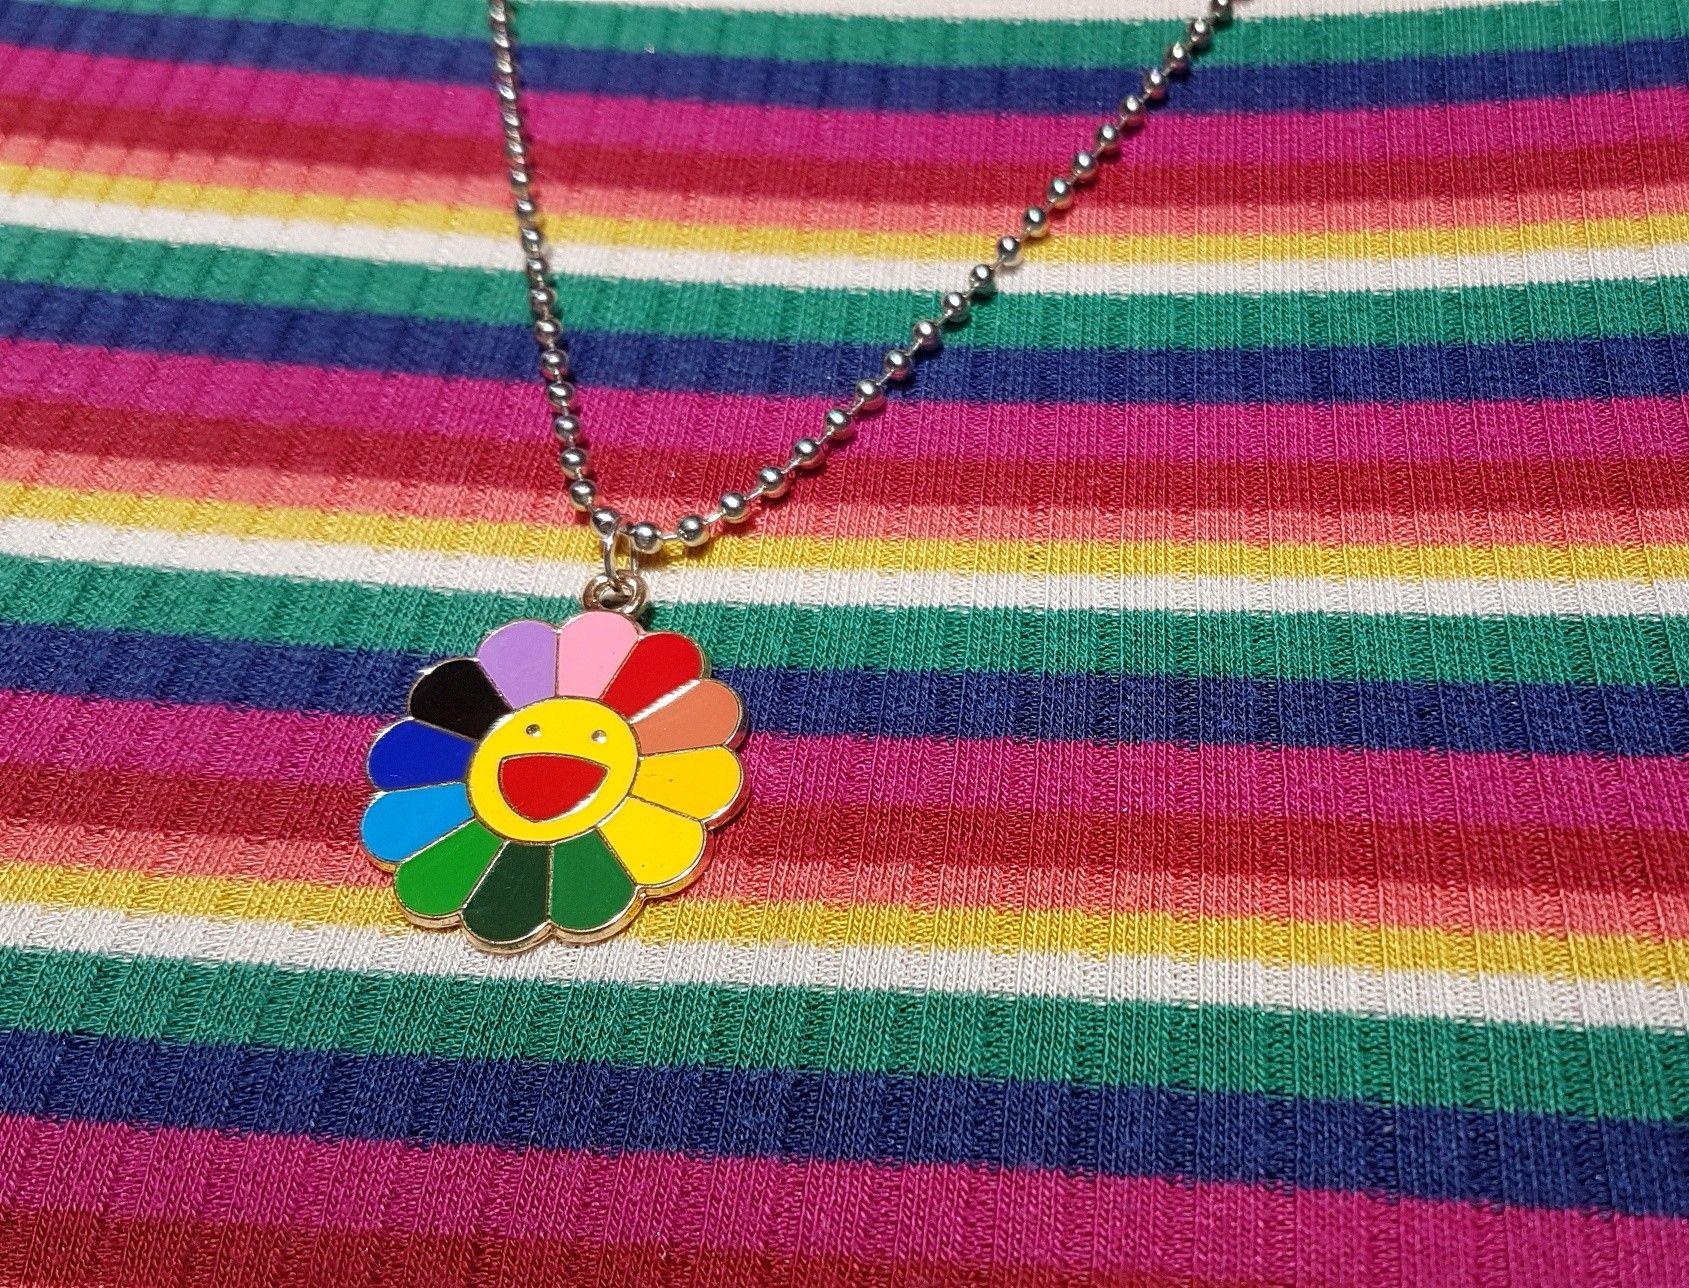 Takashi Murakami flower artist necklace Billie Eilish